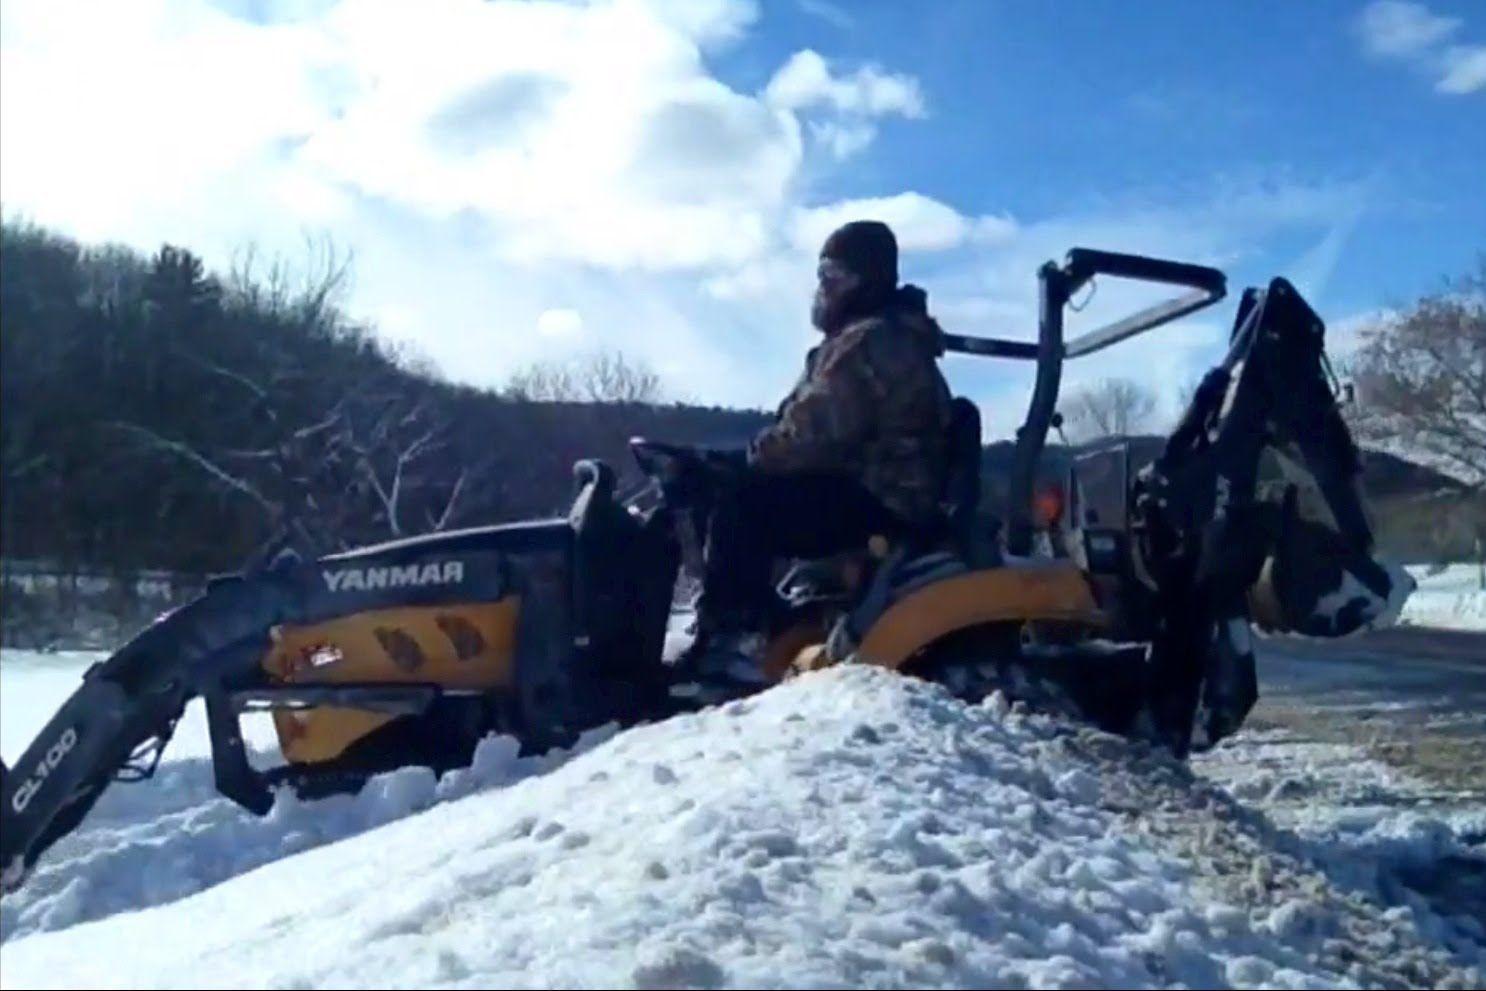 4x4 Tractor Moving Wet Heavy Snow Yanmar Sc 2450 2400 Tractors 4x4 Snow